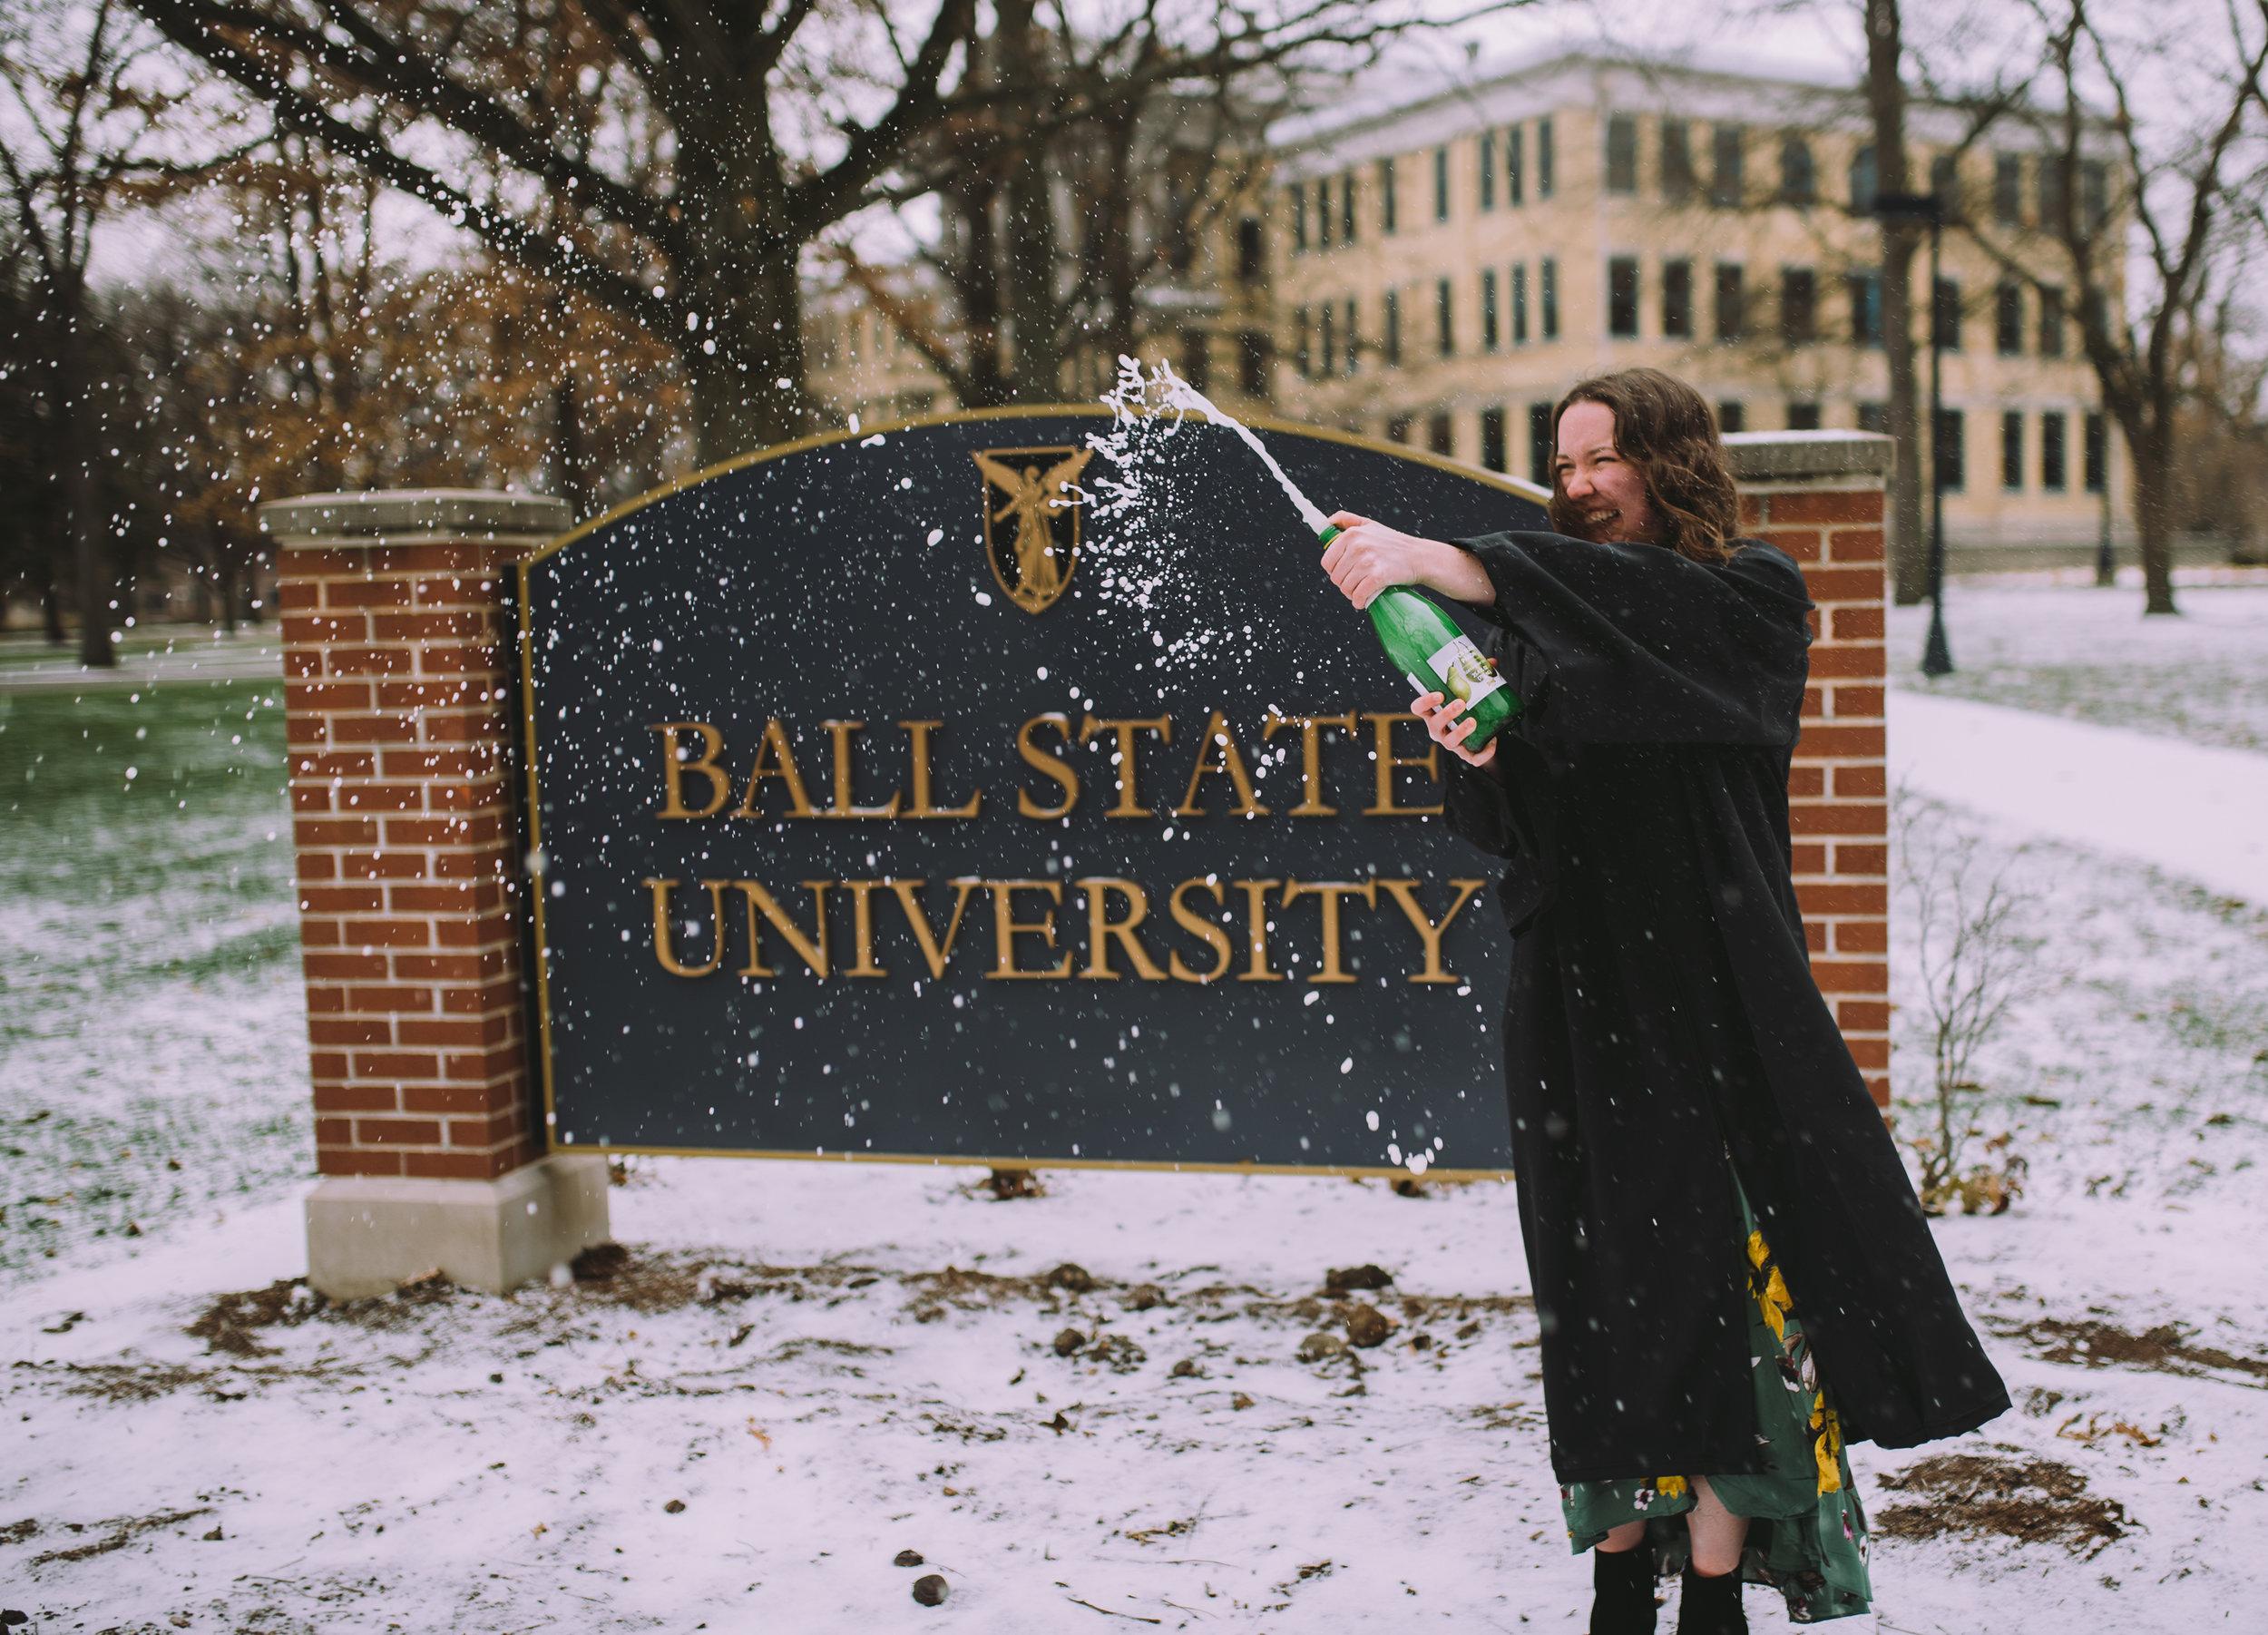 SamanthaBrammer_CollegeGraduationPortraits_BallStateUniversity_December2017_Portrait Photography In Tempe_ArizonaPortraitPhotographer_SamanthaRosePhotography_-12.jpg